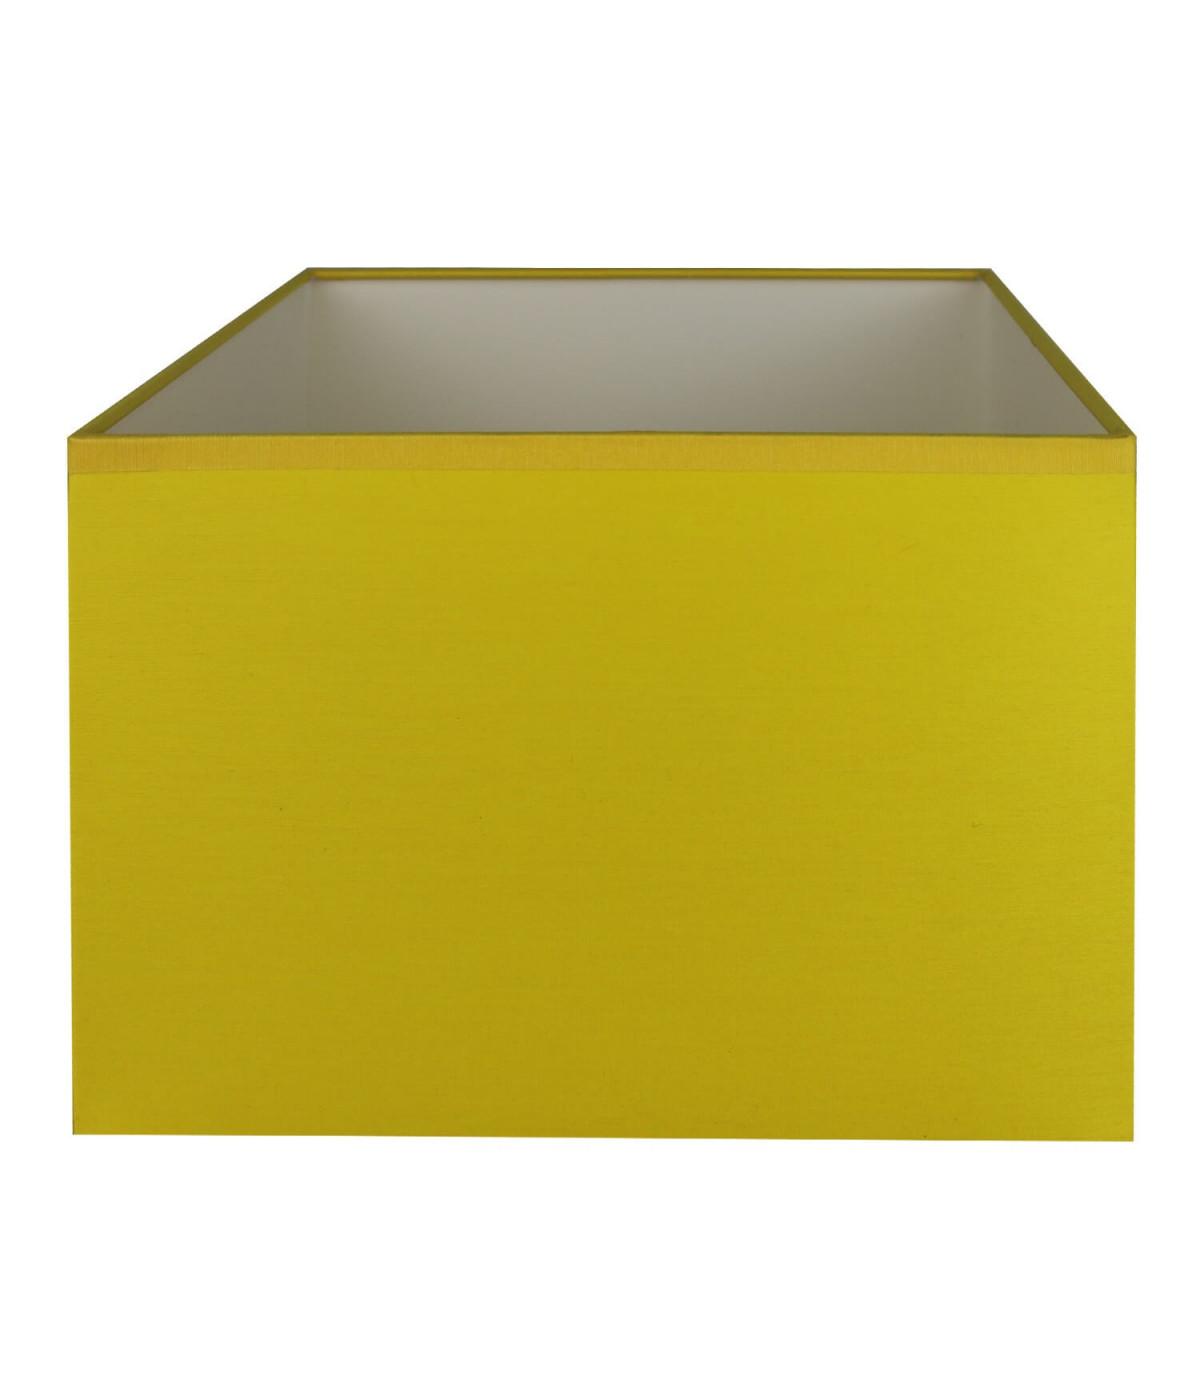 Abat-jour rectangle Jaune